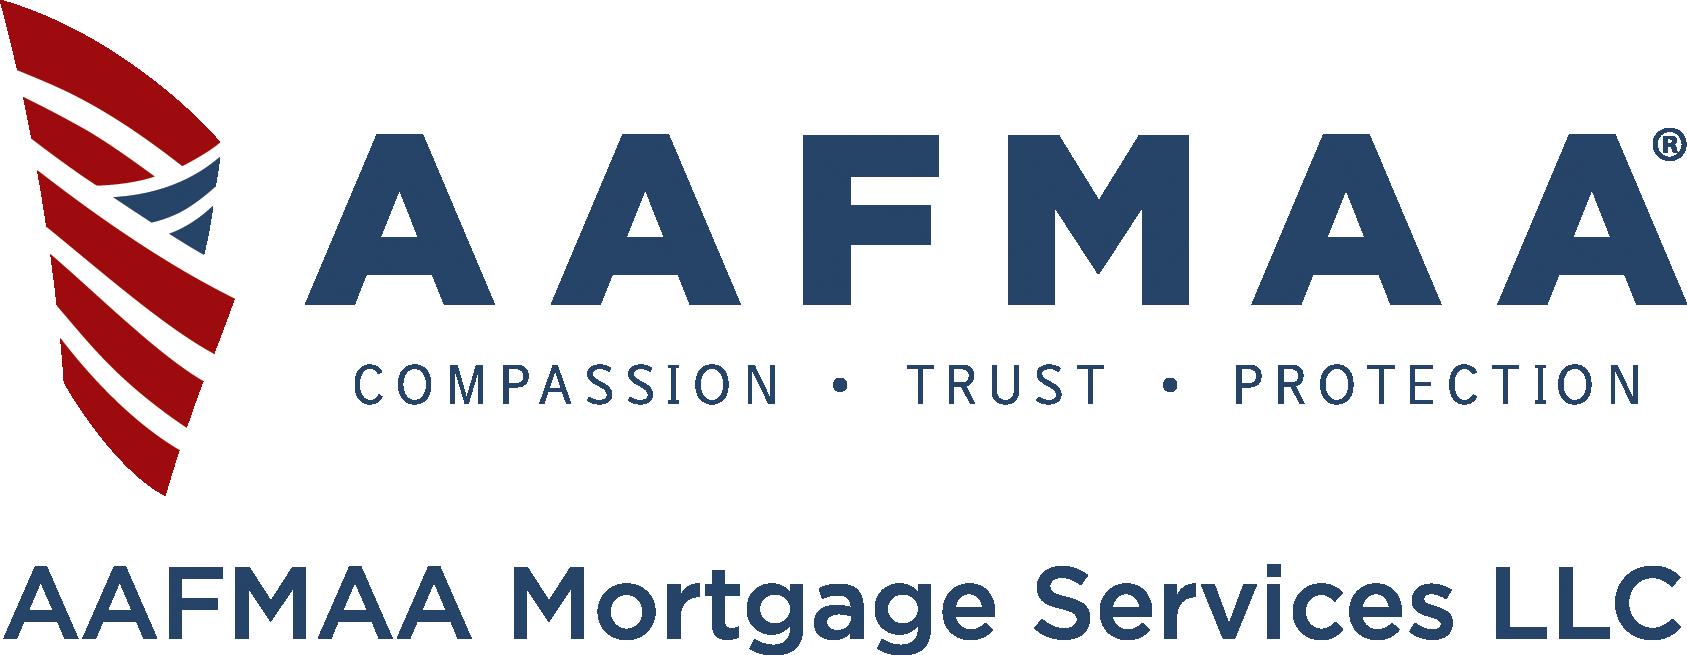 AAFMAA Mortgage Services Logo